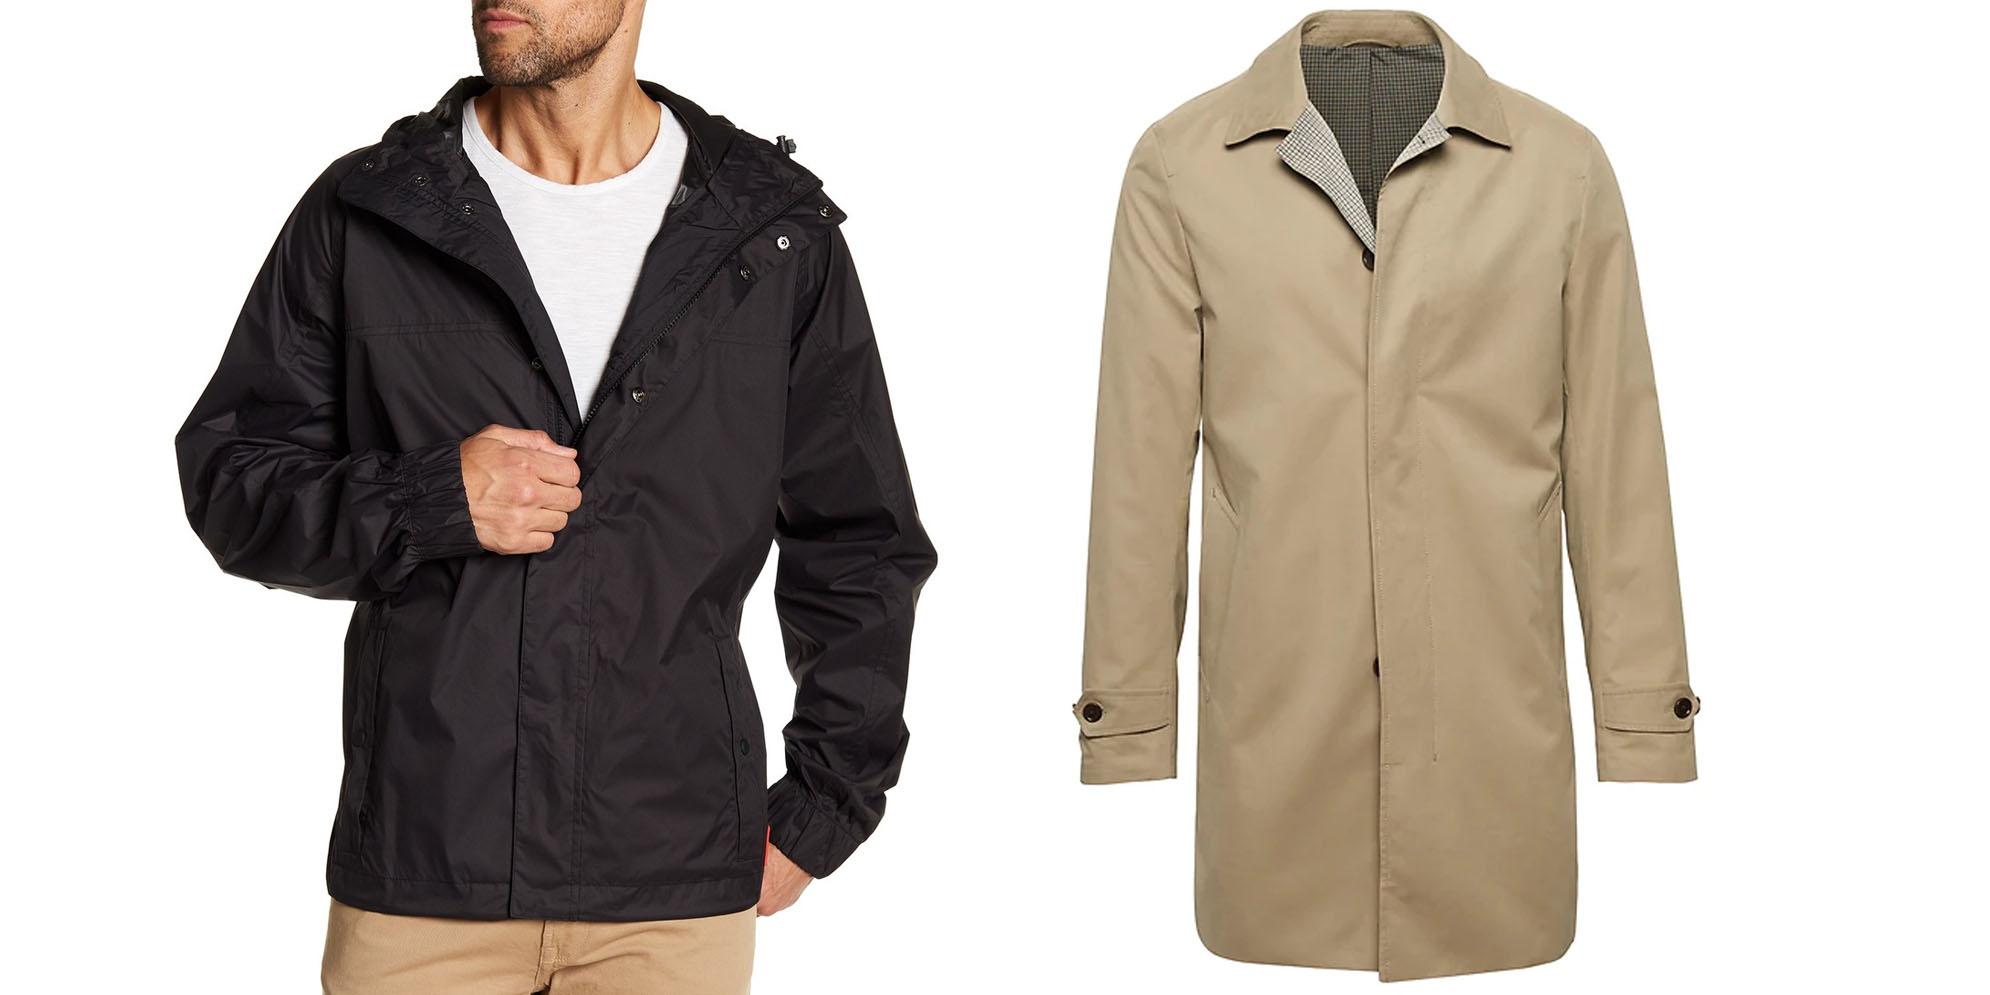 Spring rain jackets for men